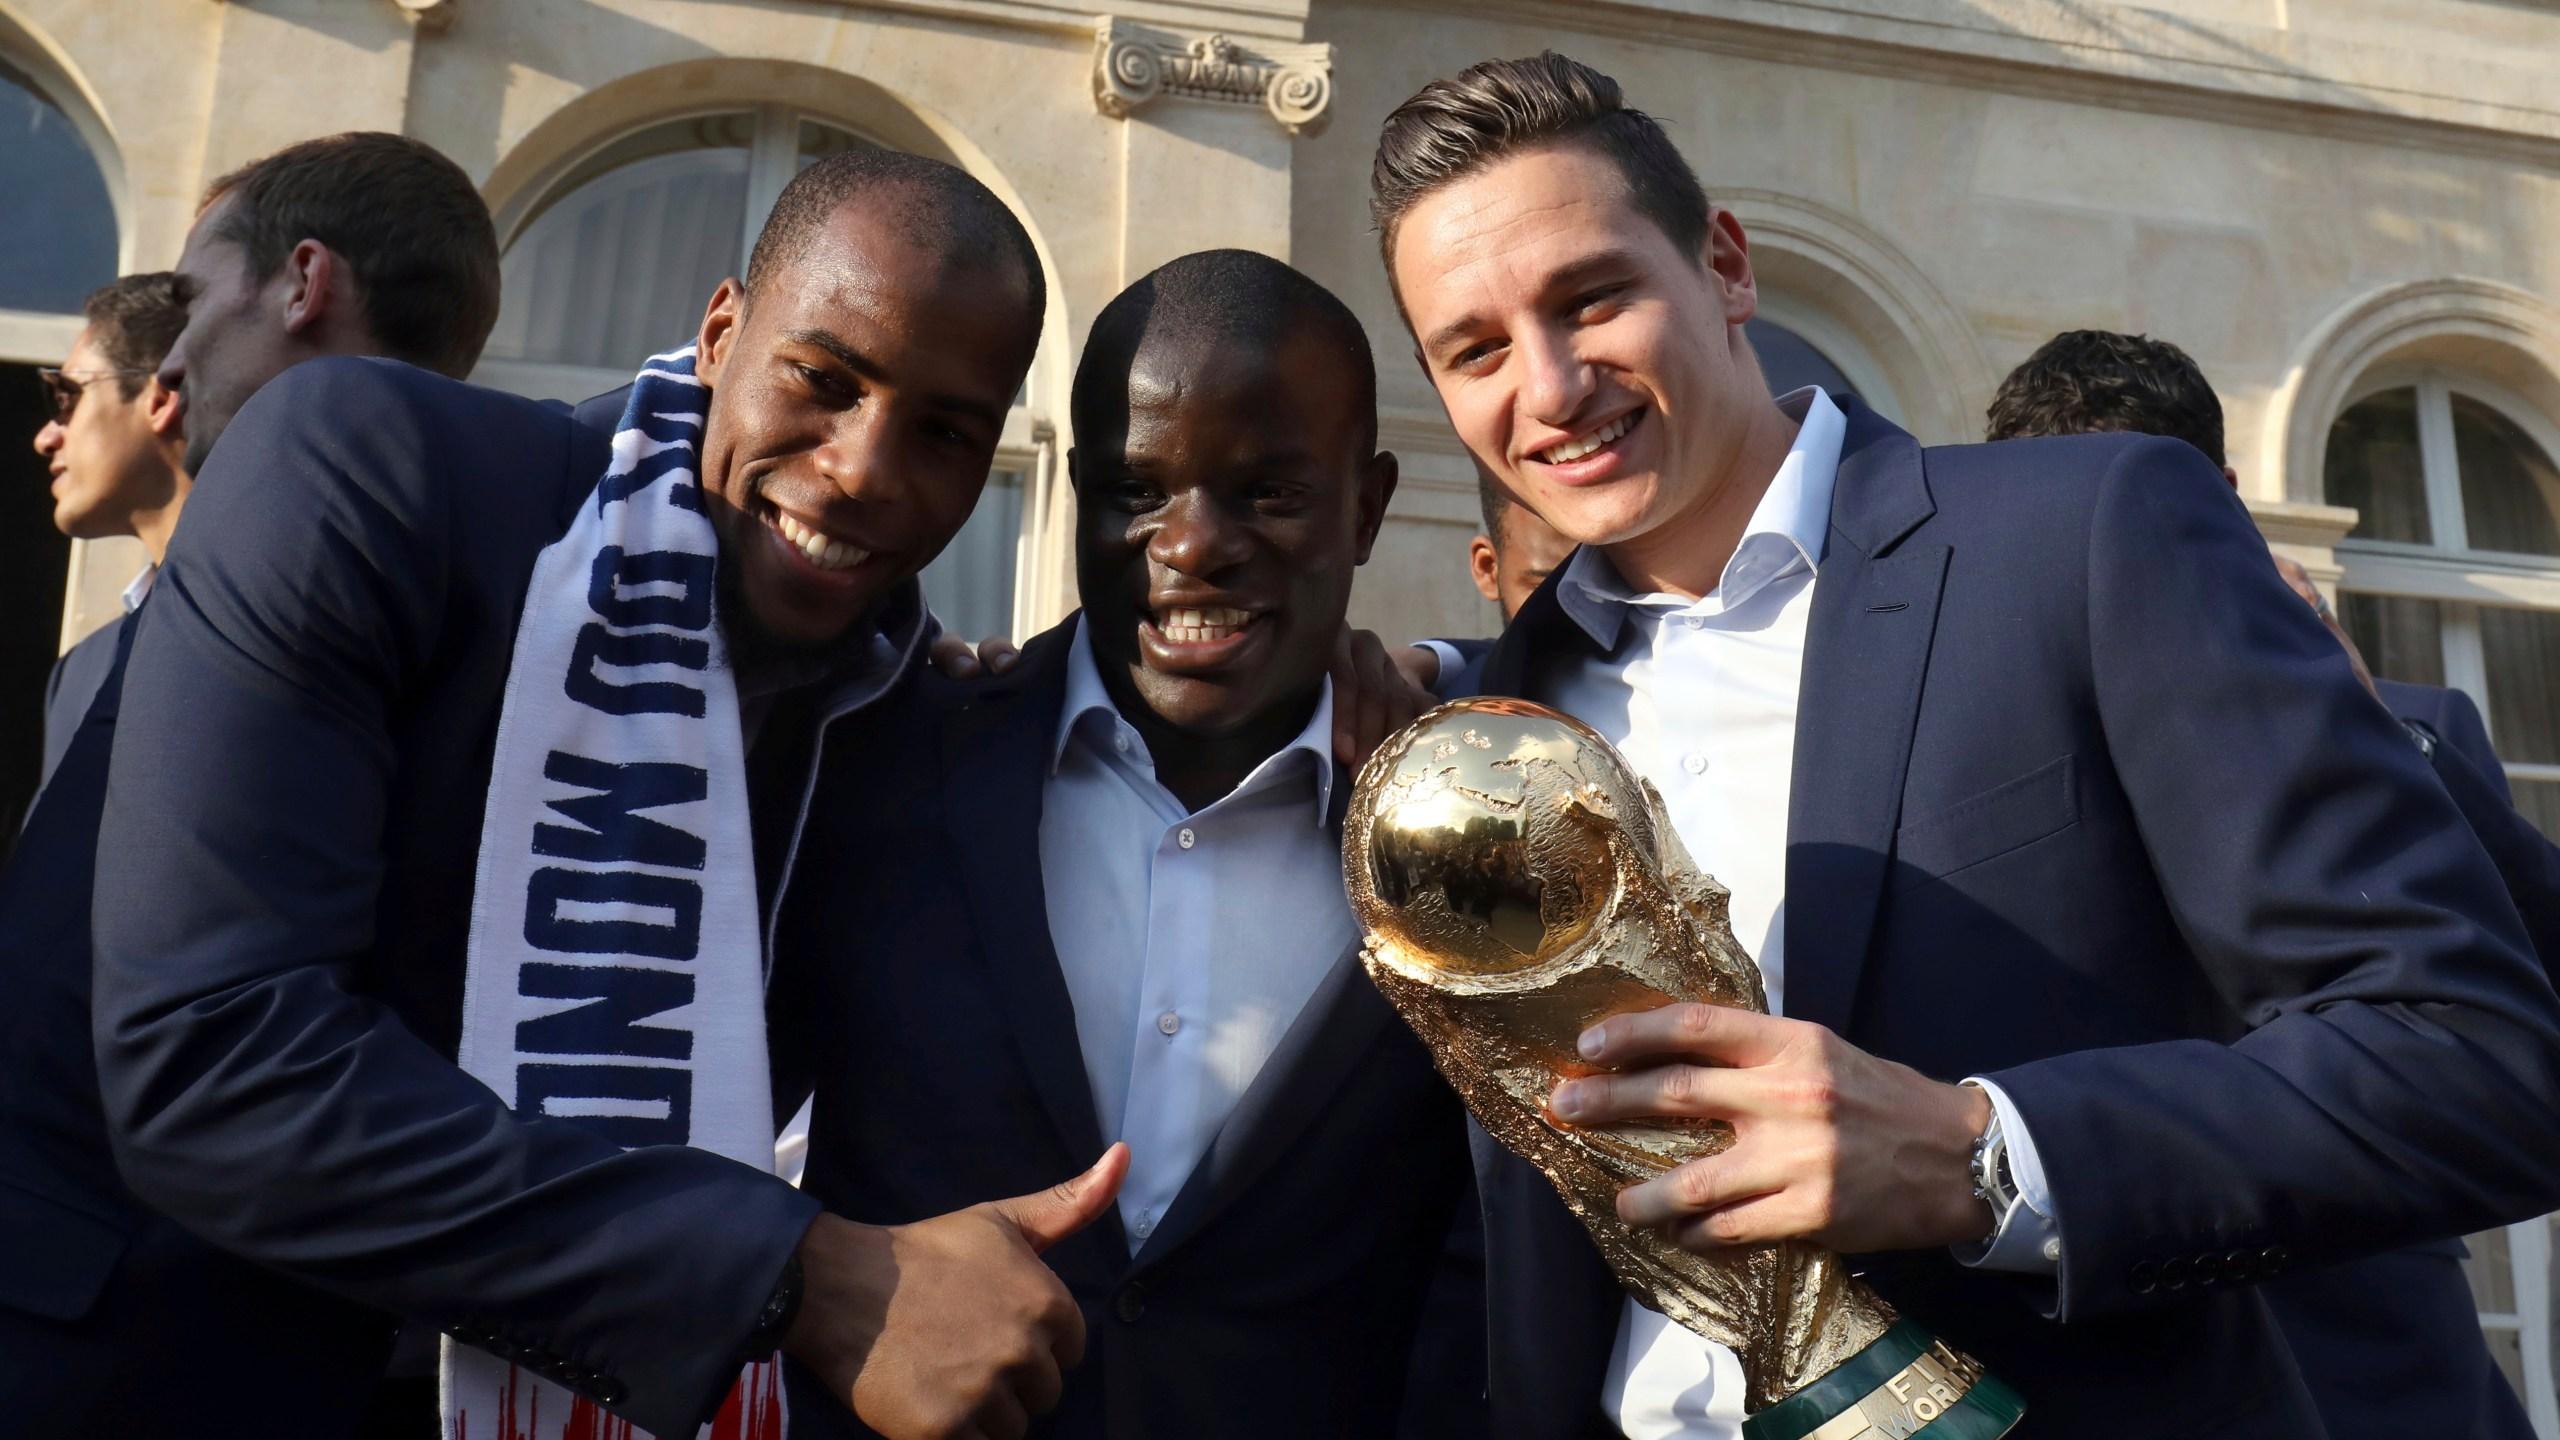 France_Soccer_WCup_37654-159532.jpg41640936